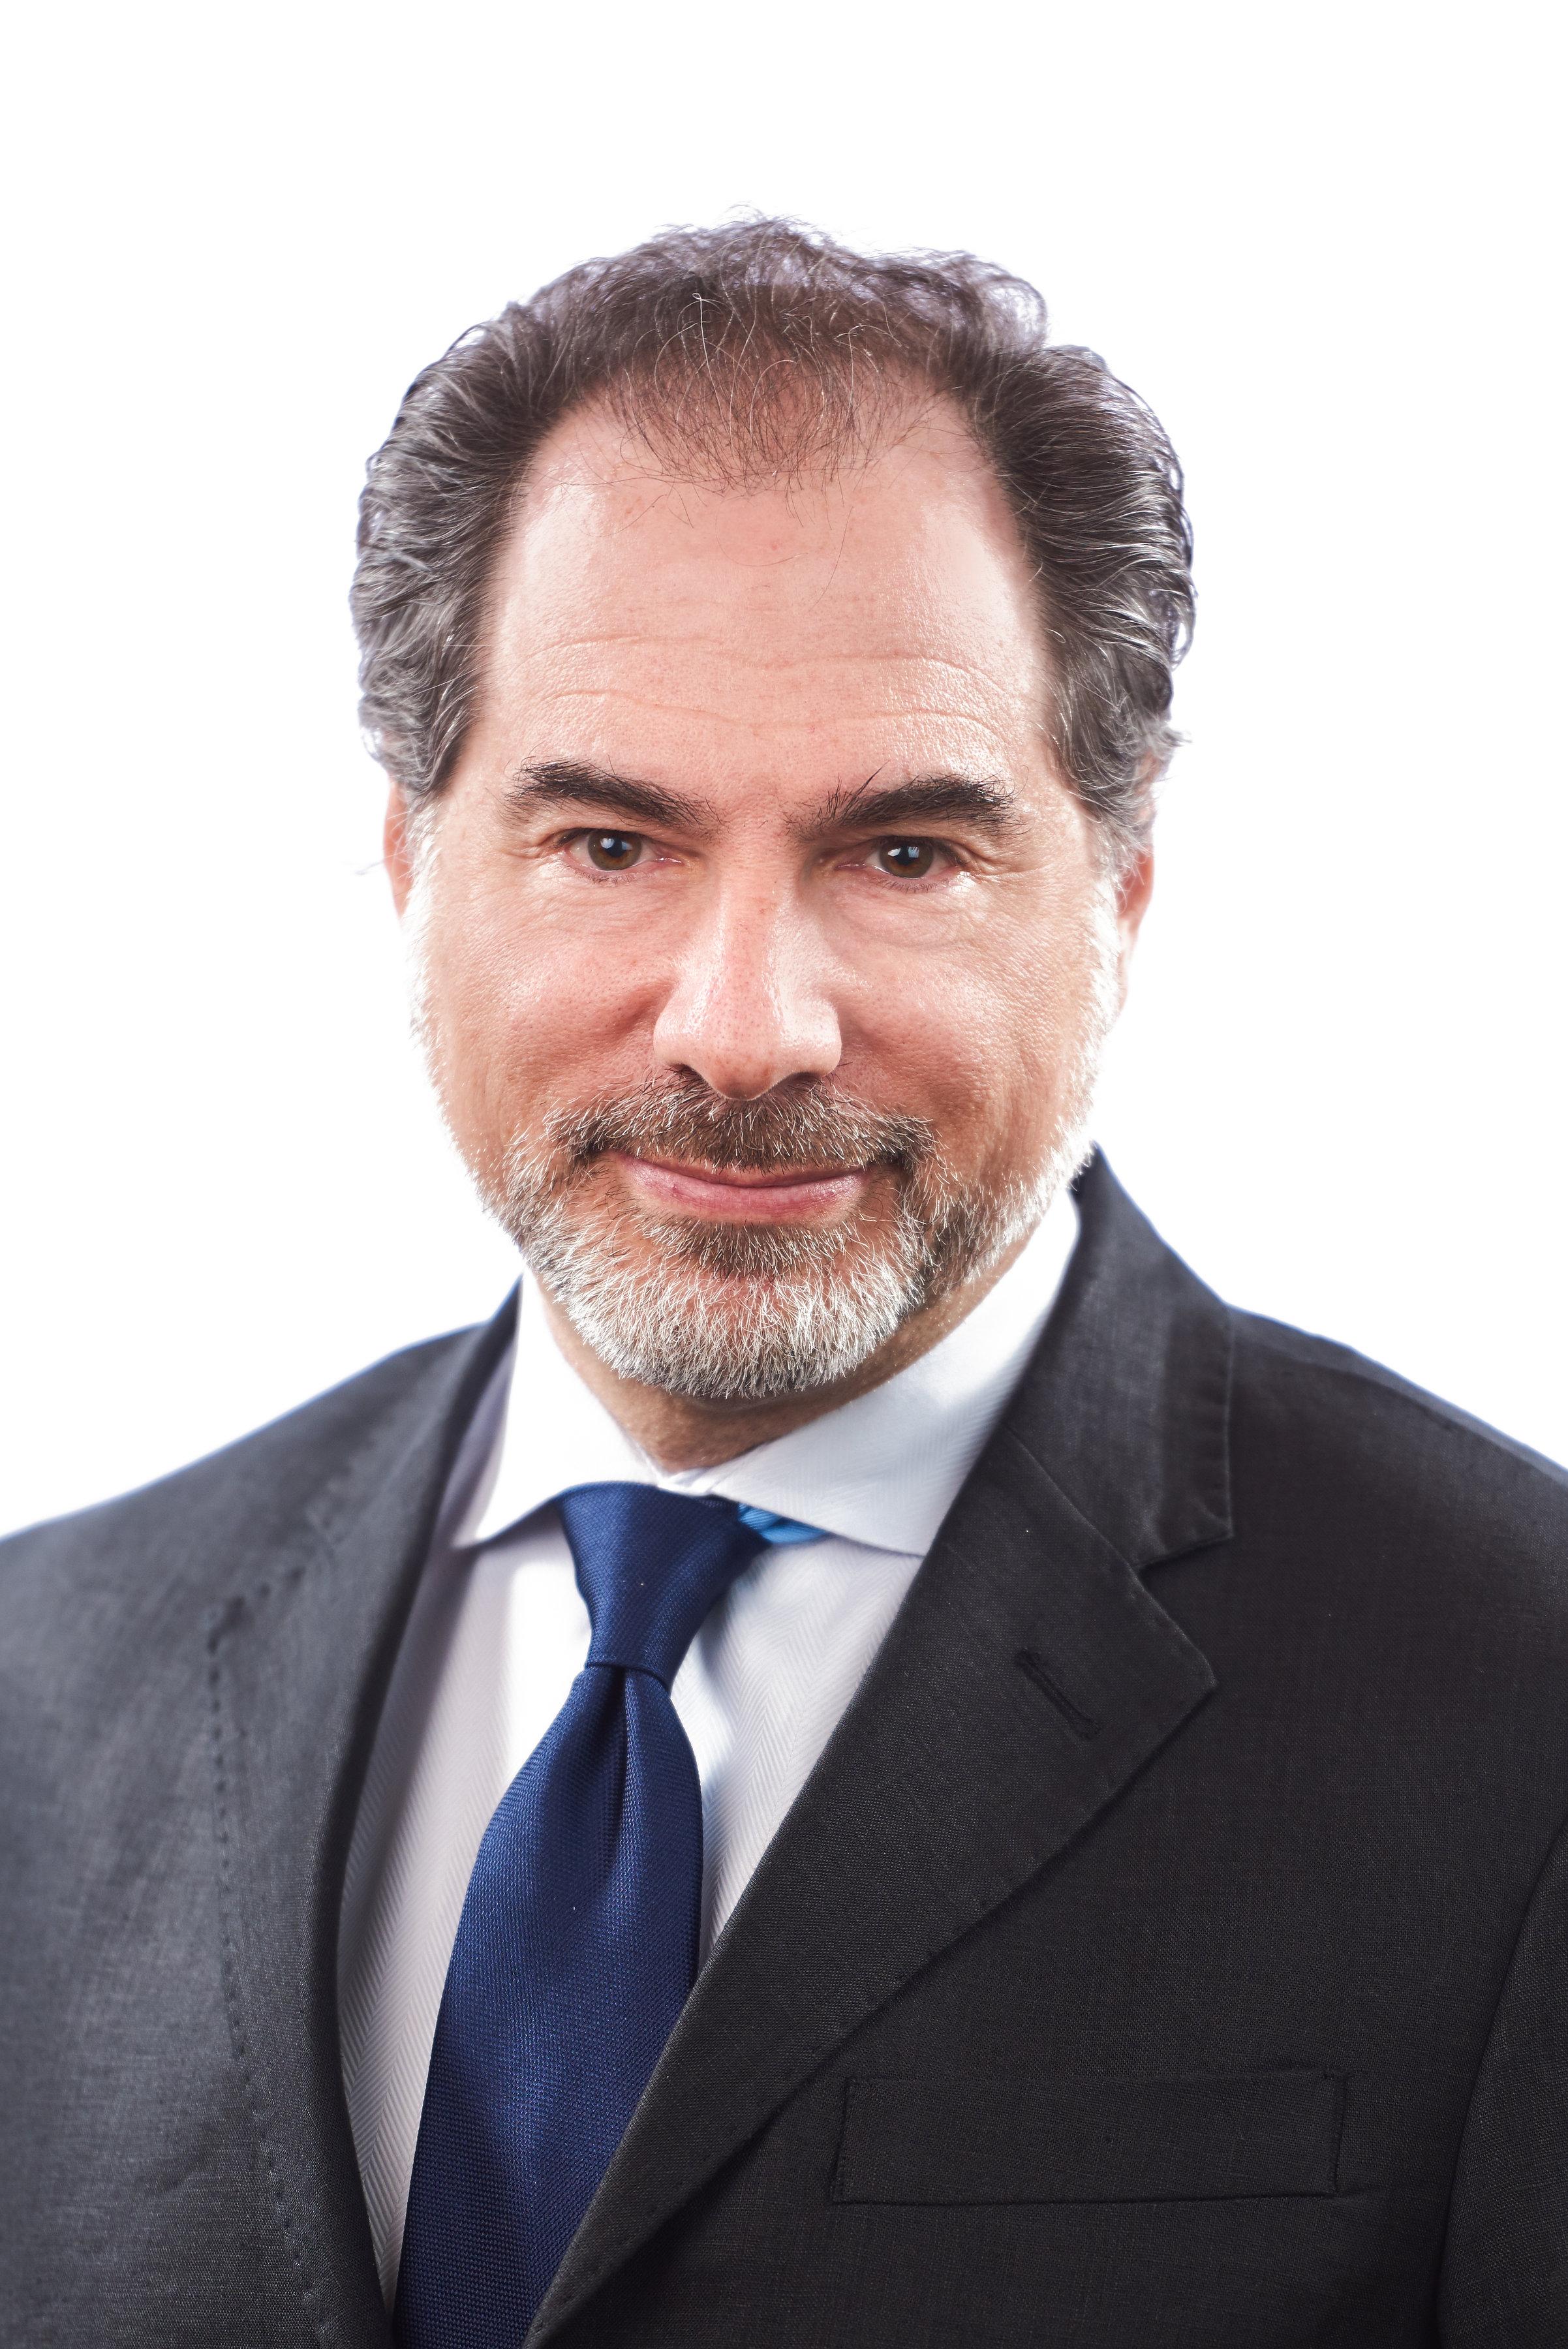 Richard Sarnoff